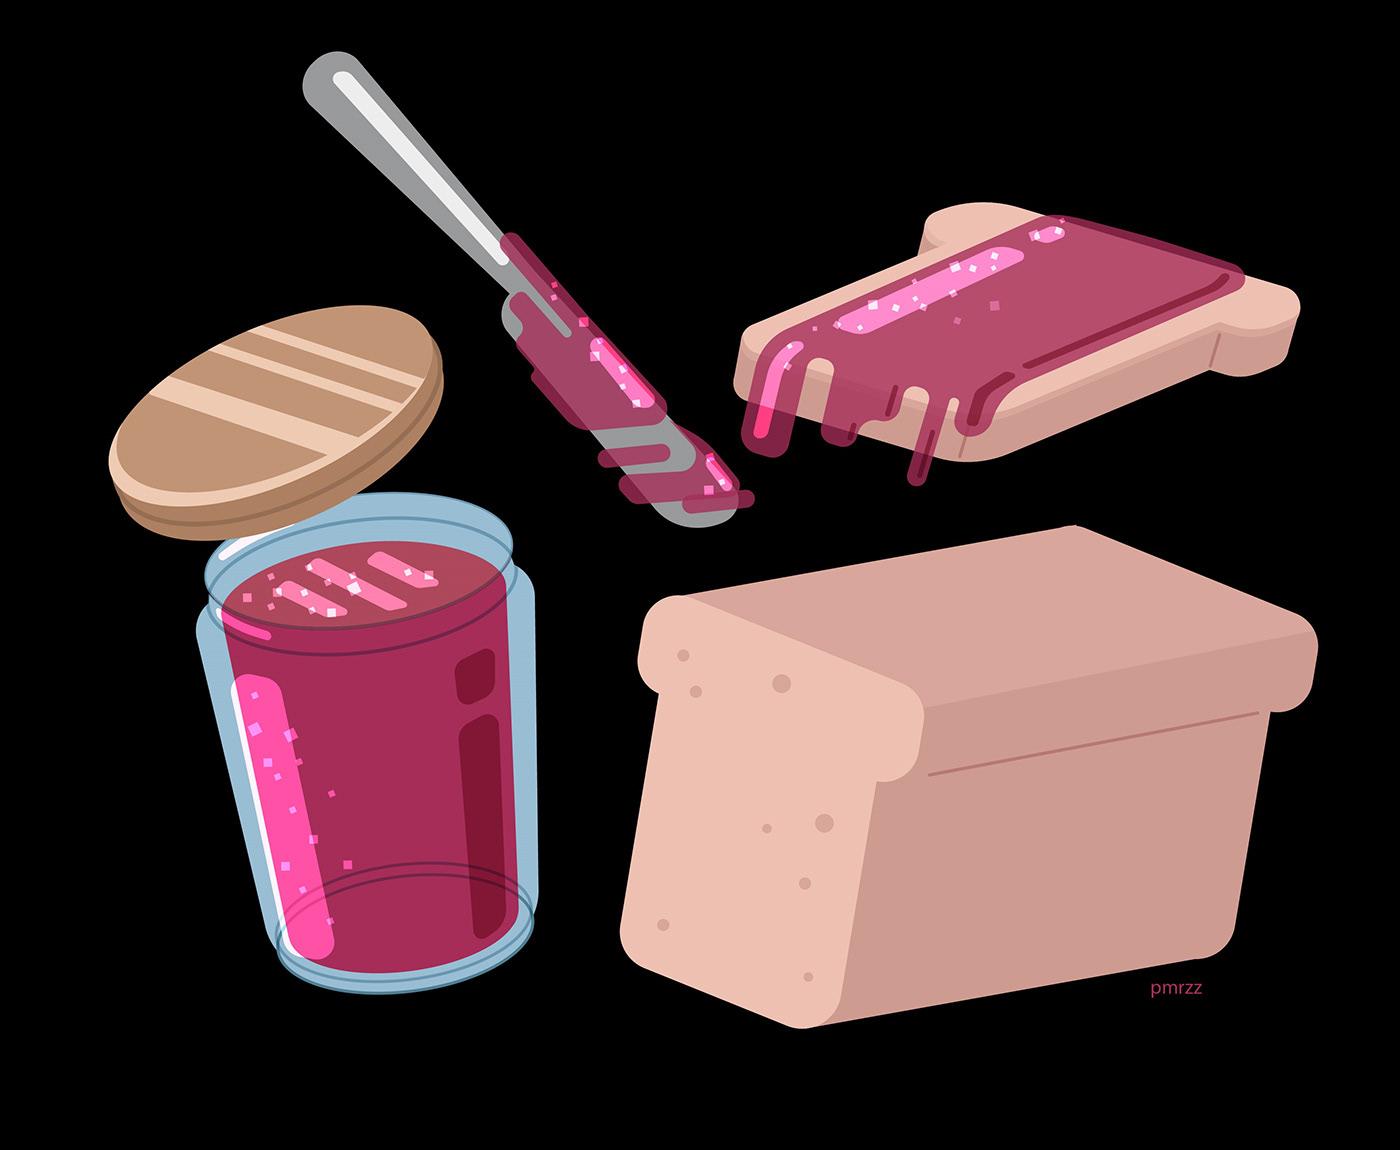 Image may contain: cartoon and pink